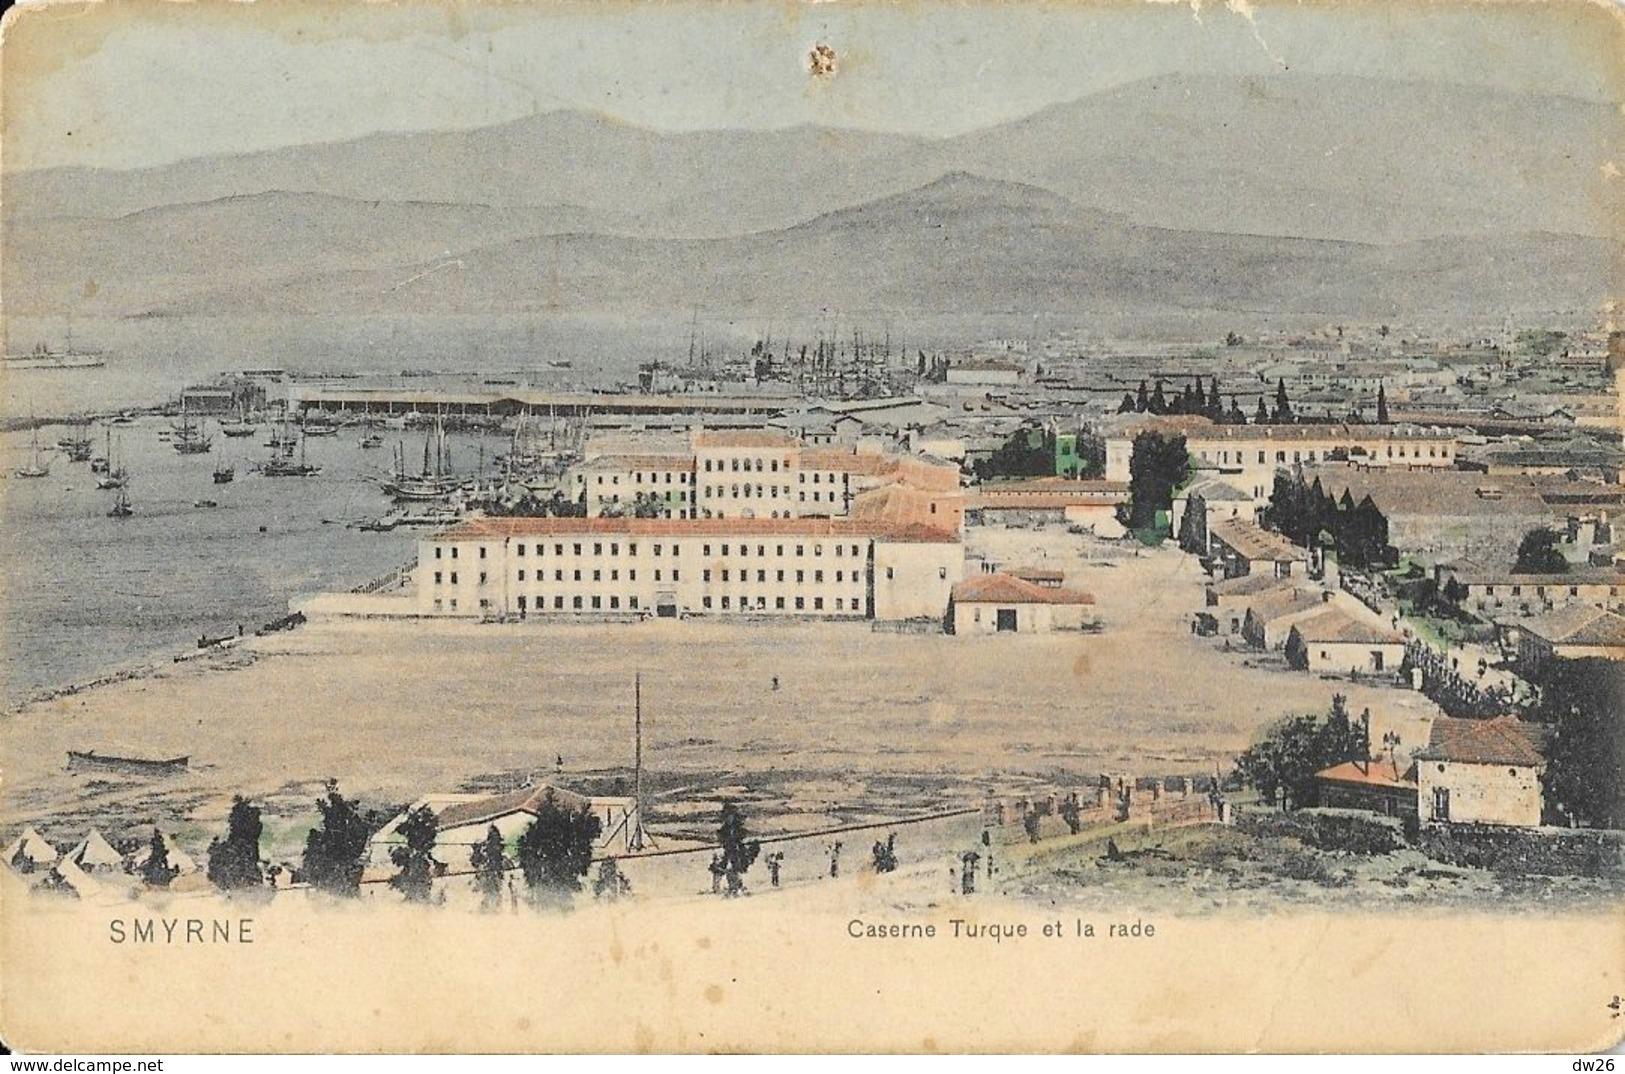 Smyrne (Izmir, Turquie) - Caserne Turque Et La Rade - Carte Colorisée Dos Simple, Non Circulée - Turquie